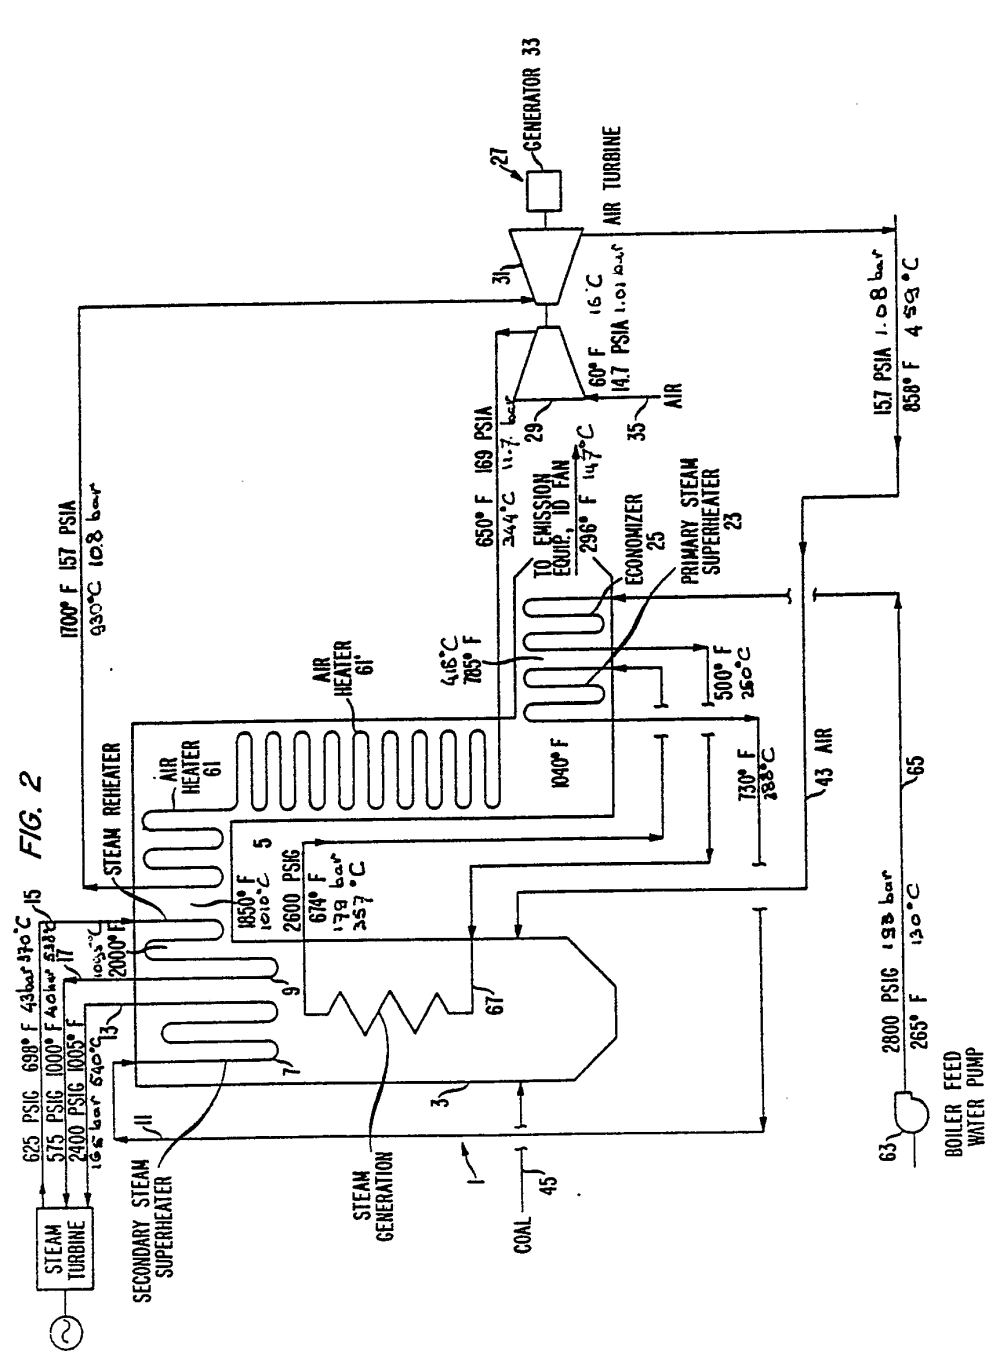 medium resolution of 92 oldsmobile silhouette fuse box auto electrical wiring diagram 2002 pontiac montana fuse box diagram 1999